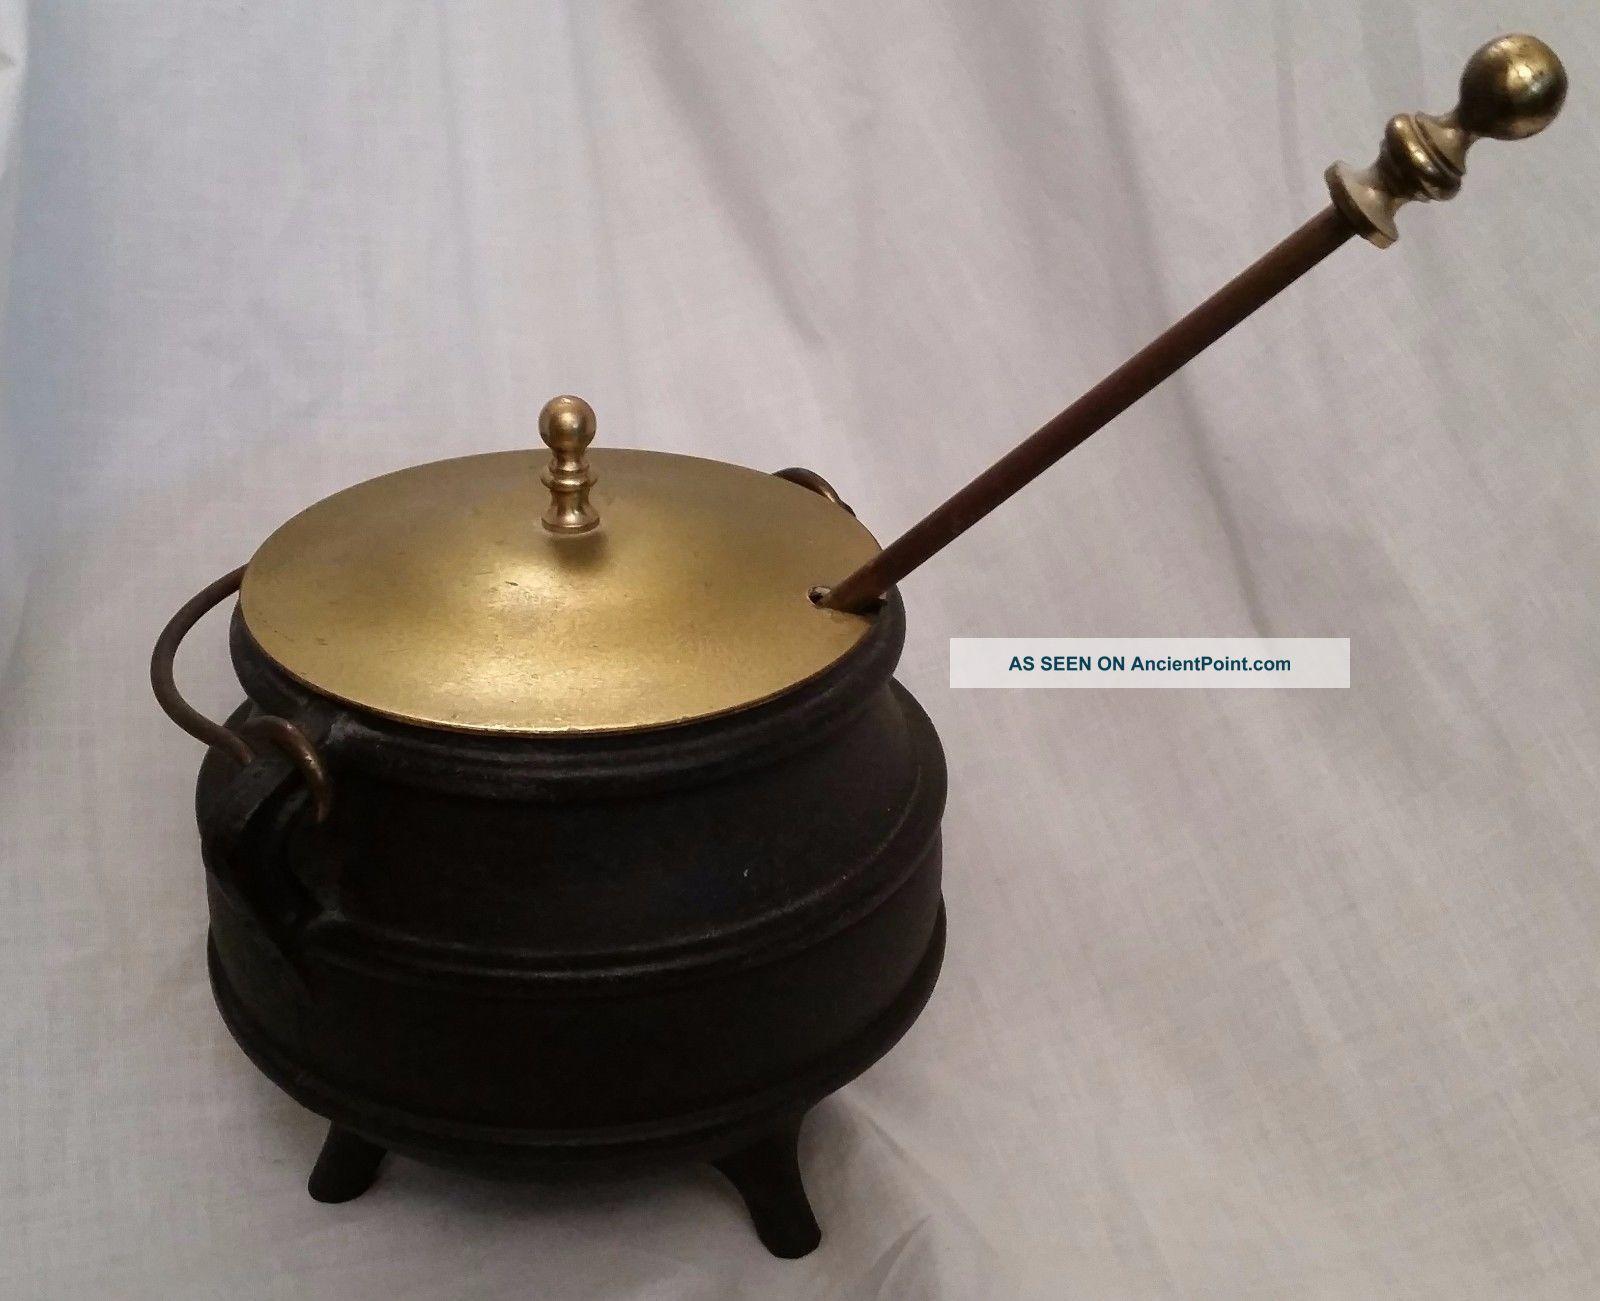 Vintage Cast Iron Pot Cauldron Kettle W Brass Lid Fire Starter Pumice Wand Hearth Ware photo